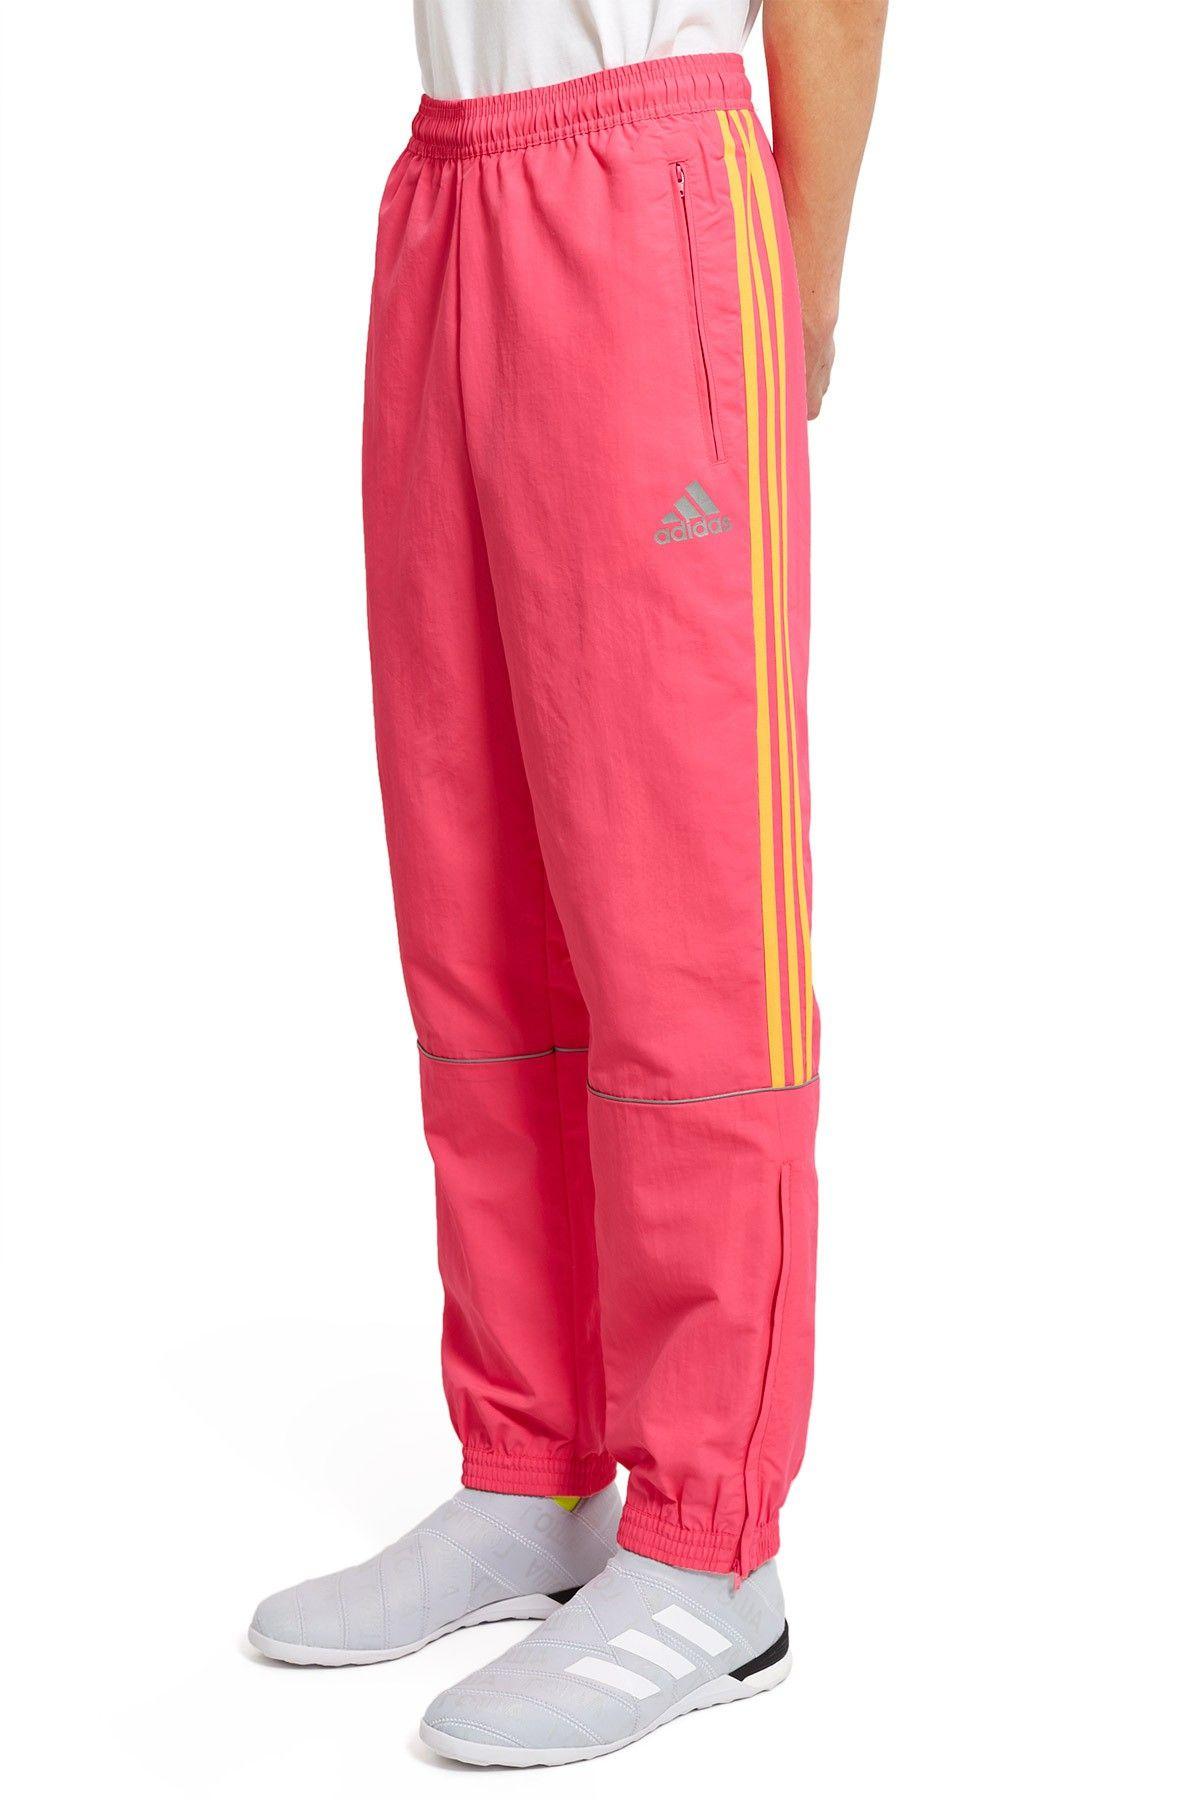 Concurso familia real Larry Belmont  Gosha Rubchinskiy | Gosha Rubchinskiy x Adidas Track Pants | Opening  Ceremony | Mens outfits, Adidas track pants, Shop mens clothing